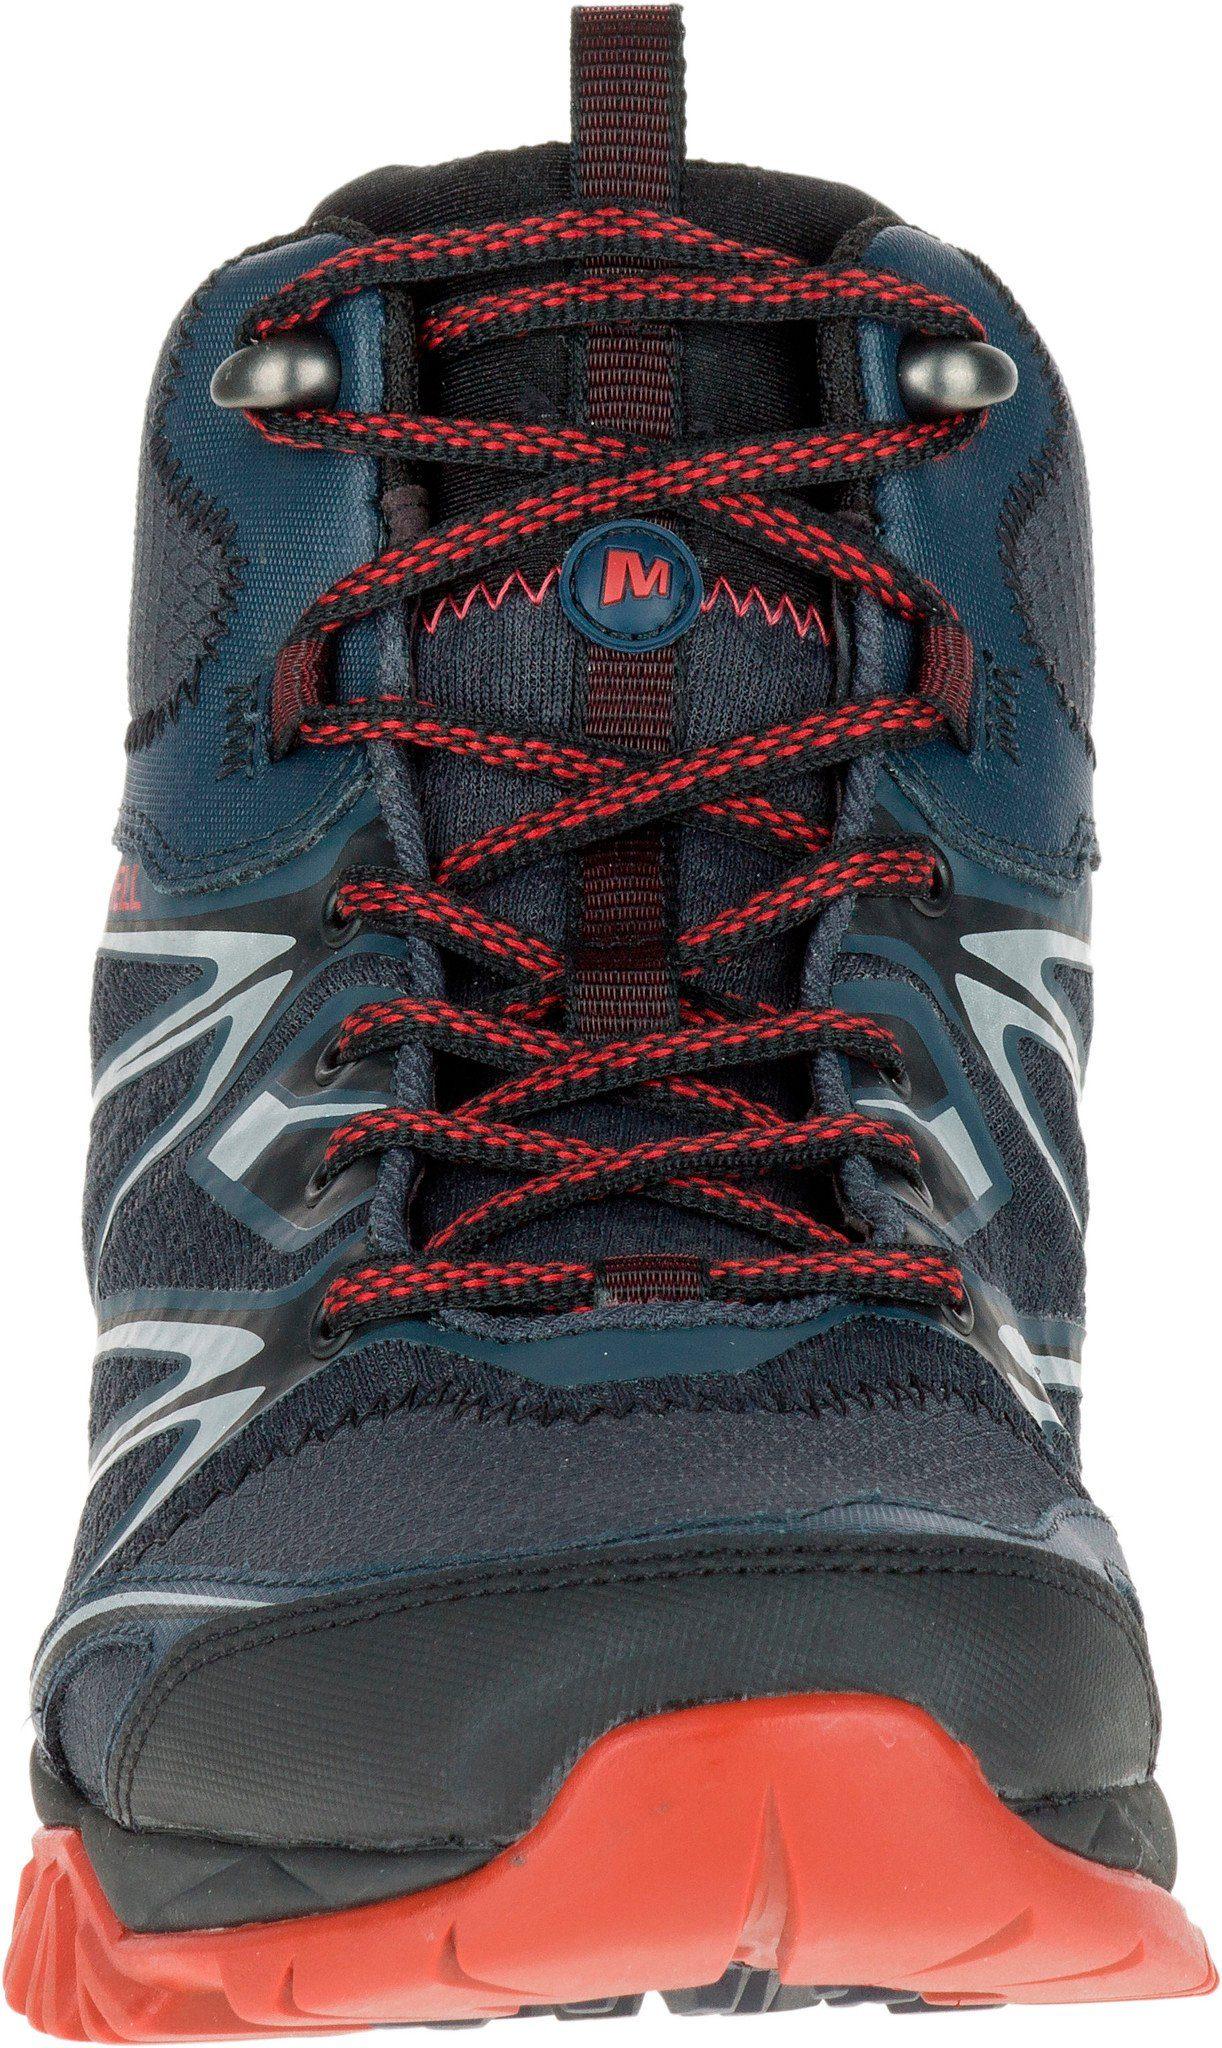 Merrell Kletterschuh Capra Bolt Mid GTX Shoes Men online kaufen  blau